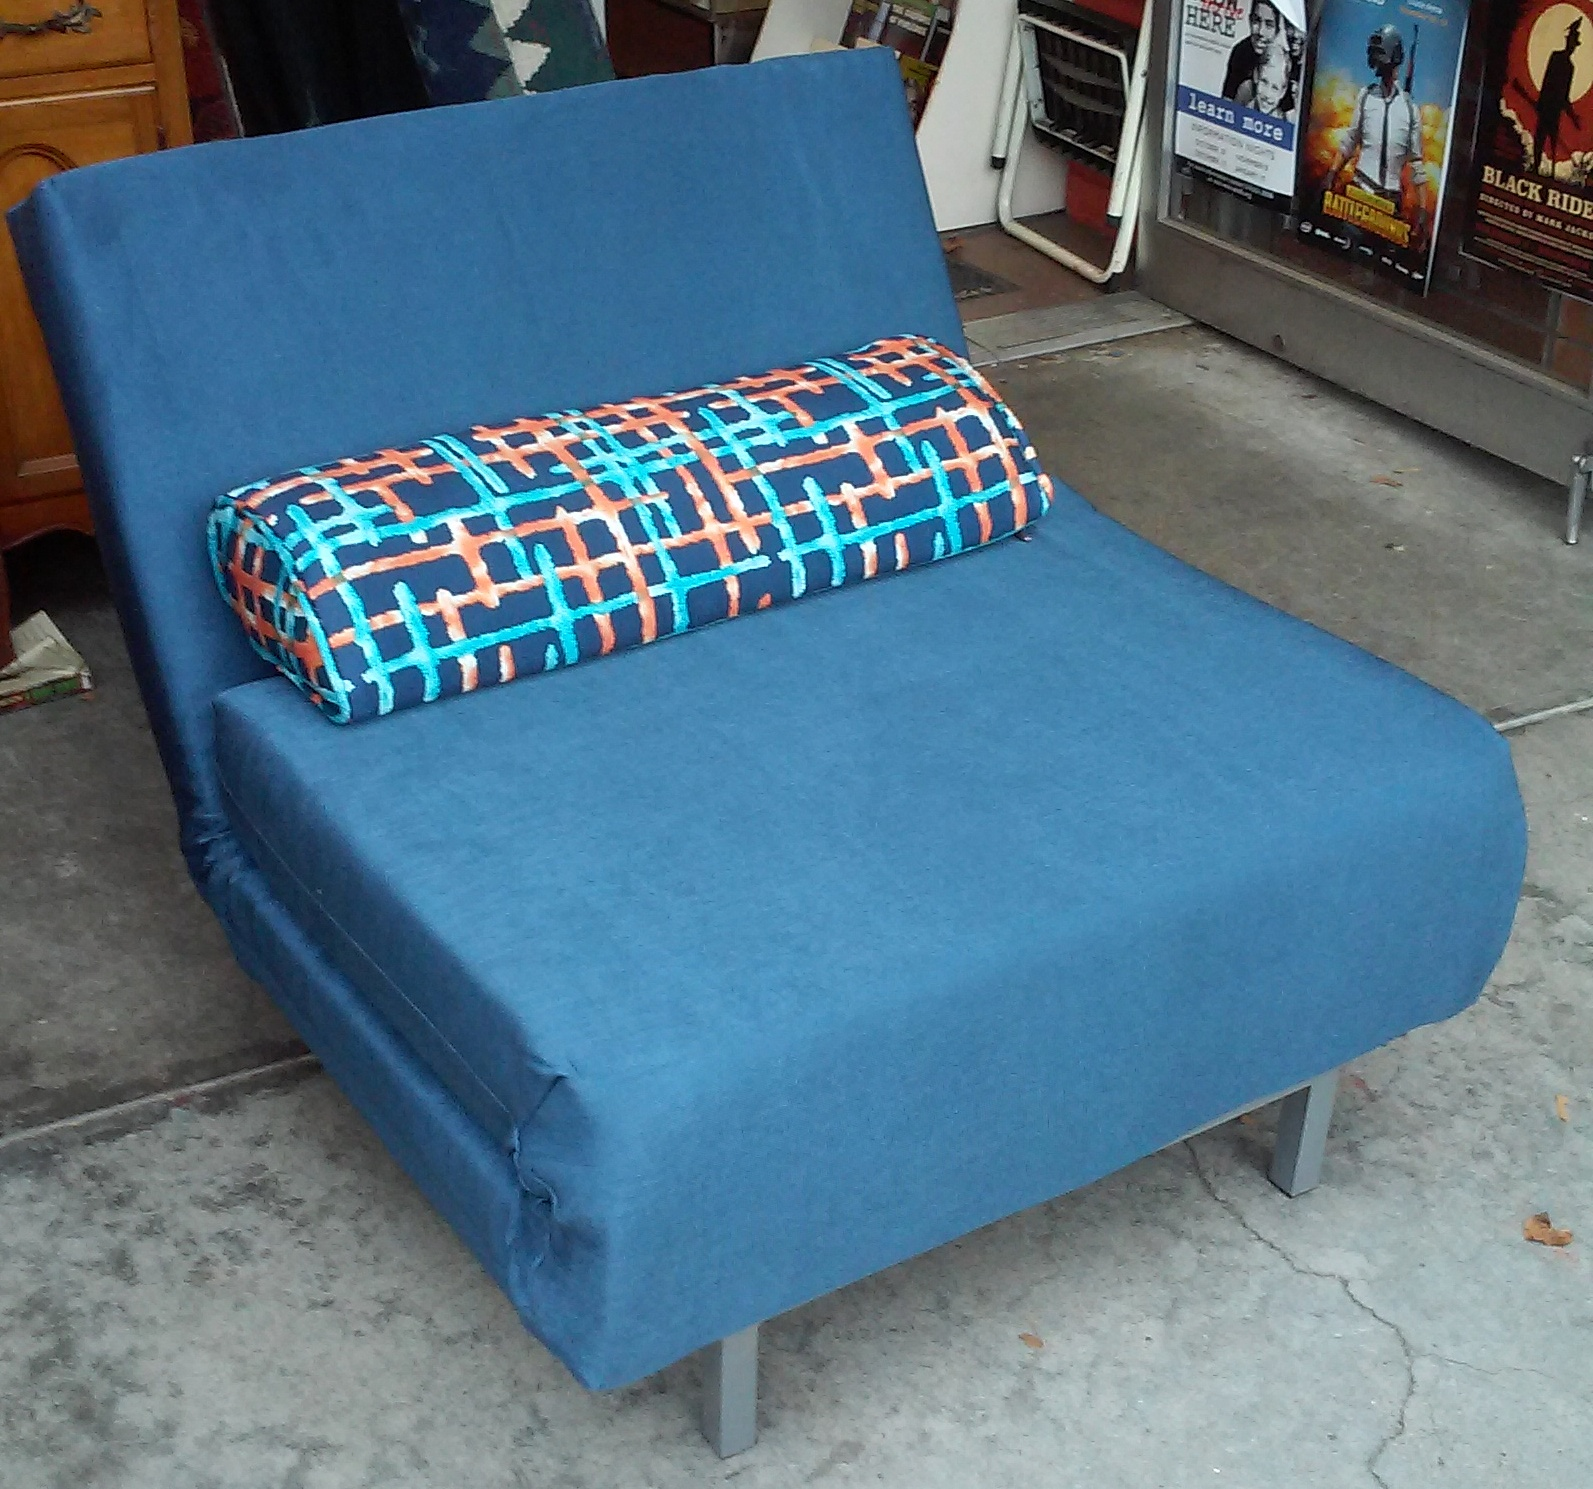 Superb Uhuru Furniture Collectibles Sold Bargain Buy 7951 Dailytribune Chair Design For Home Dailytribuneorg